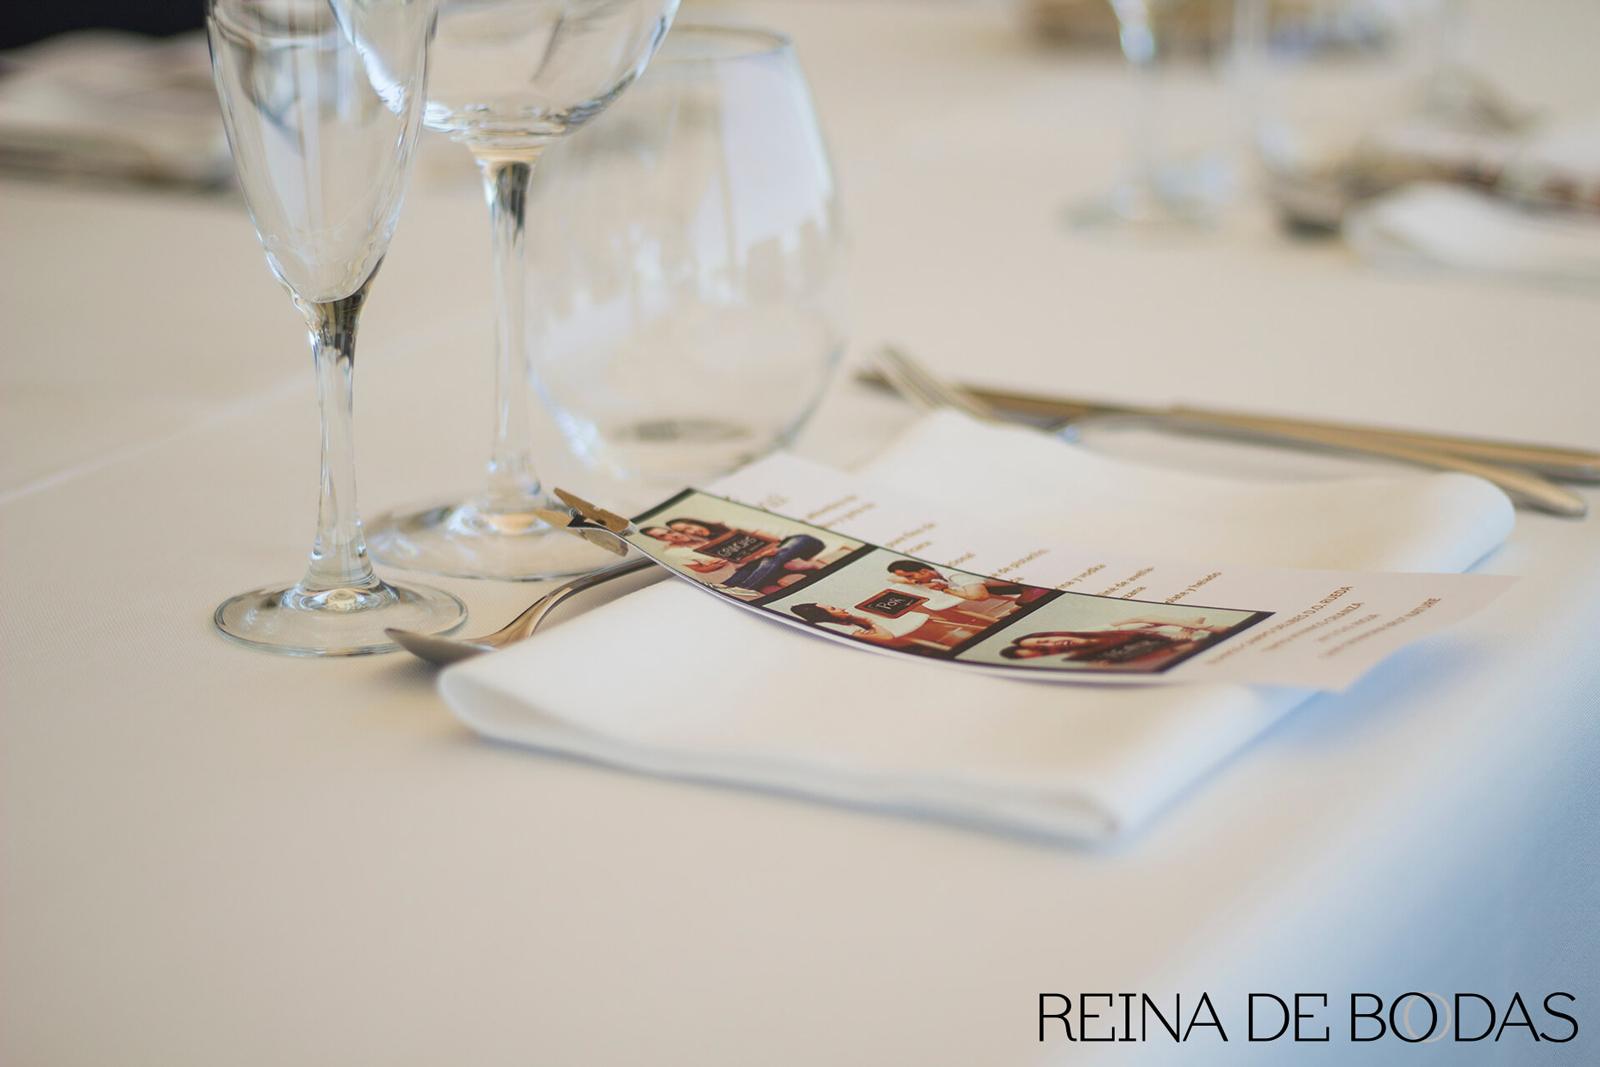 REINA_DE_BODAS_Irune_Mikel_07